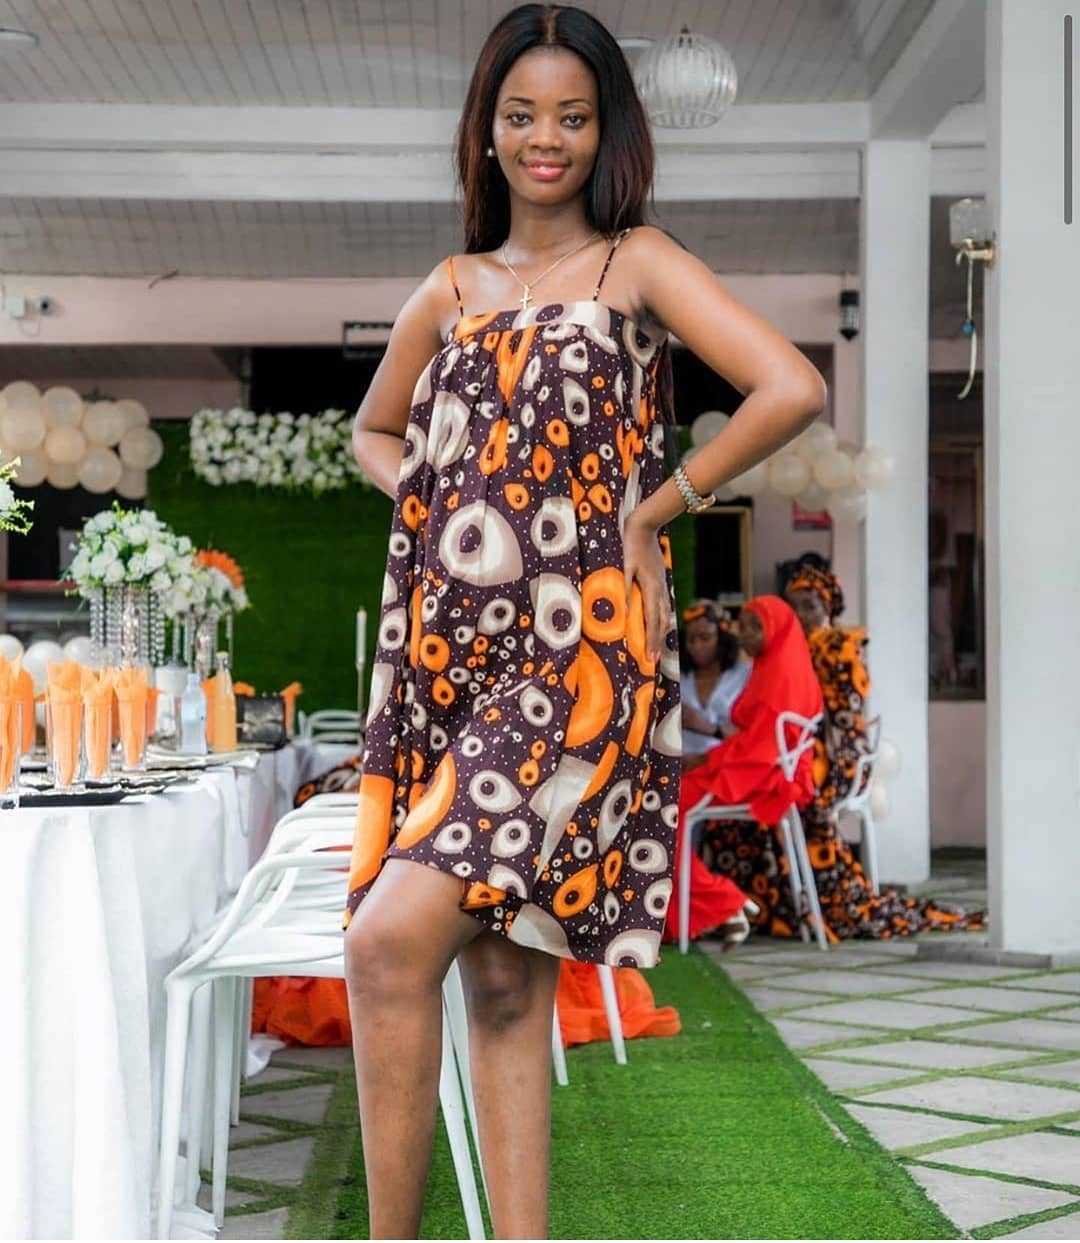 TRENDY FLORAL DRESSES 2020: MIX OF STYLISH ANKARA DRESSES 3